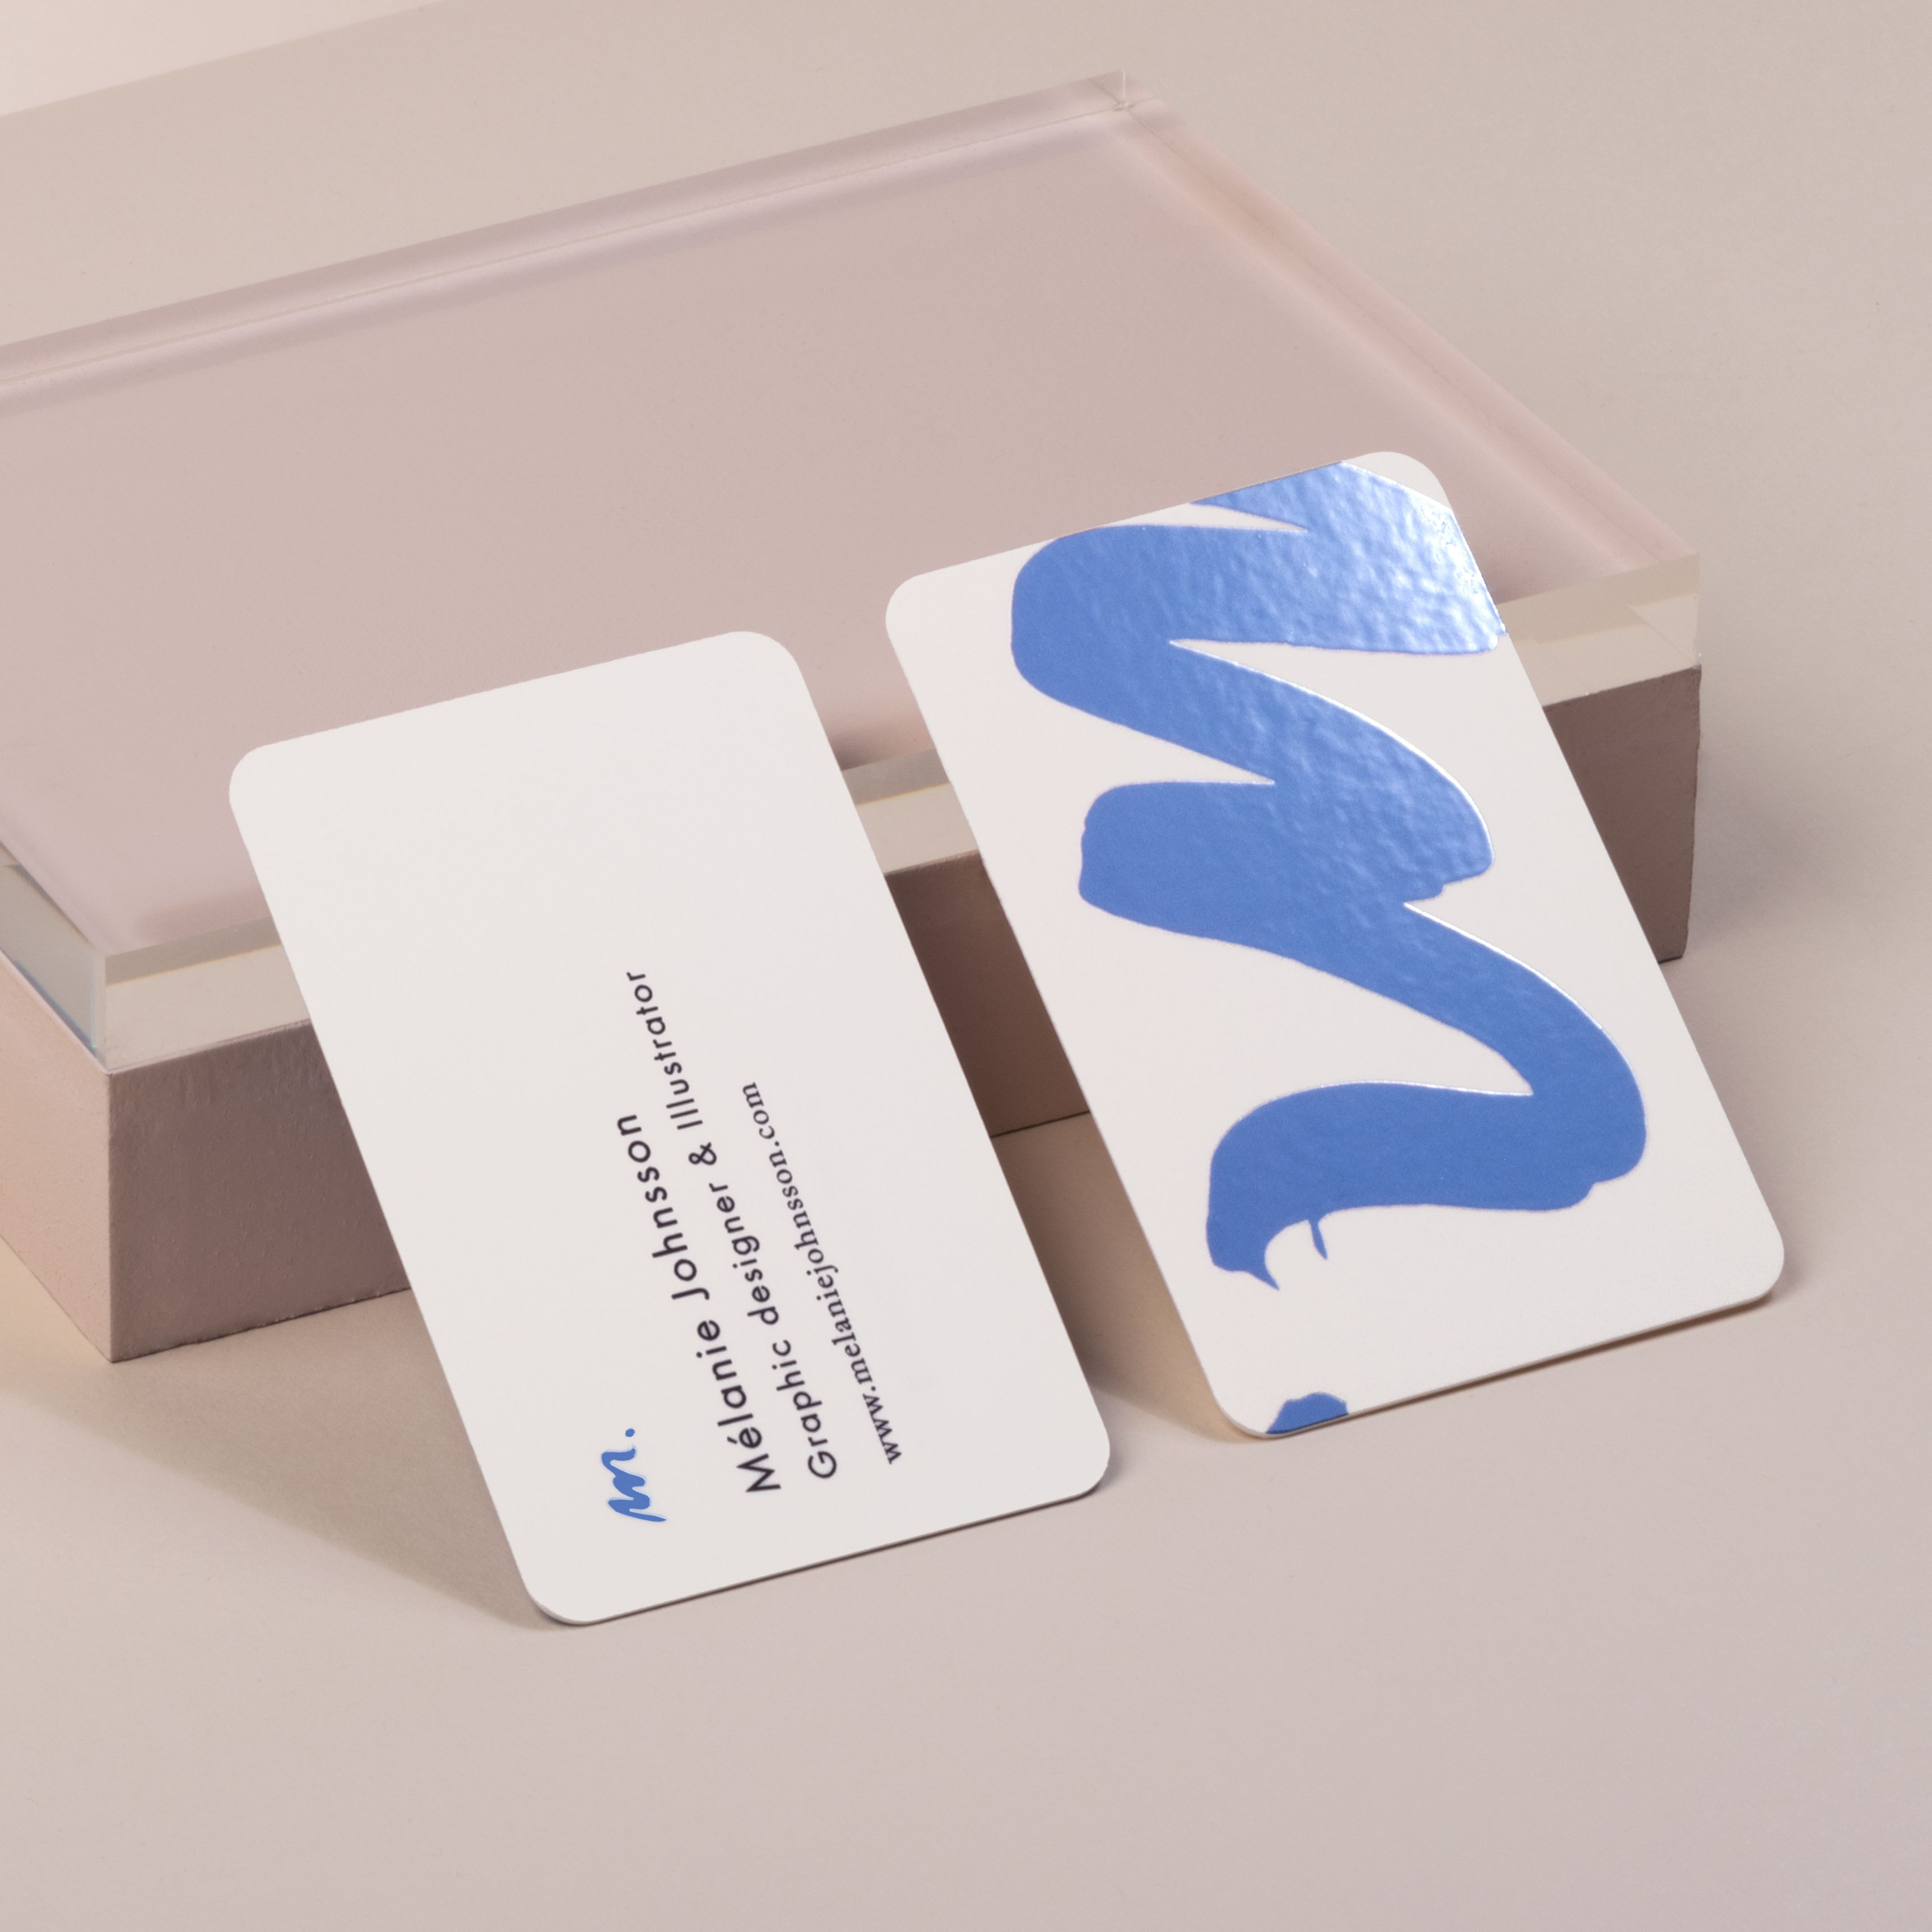 Spot Gloss Business Cards Designed By Mlanie Johnsson Melanie